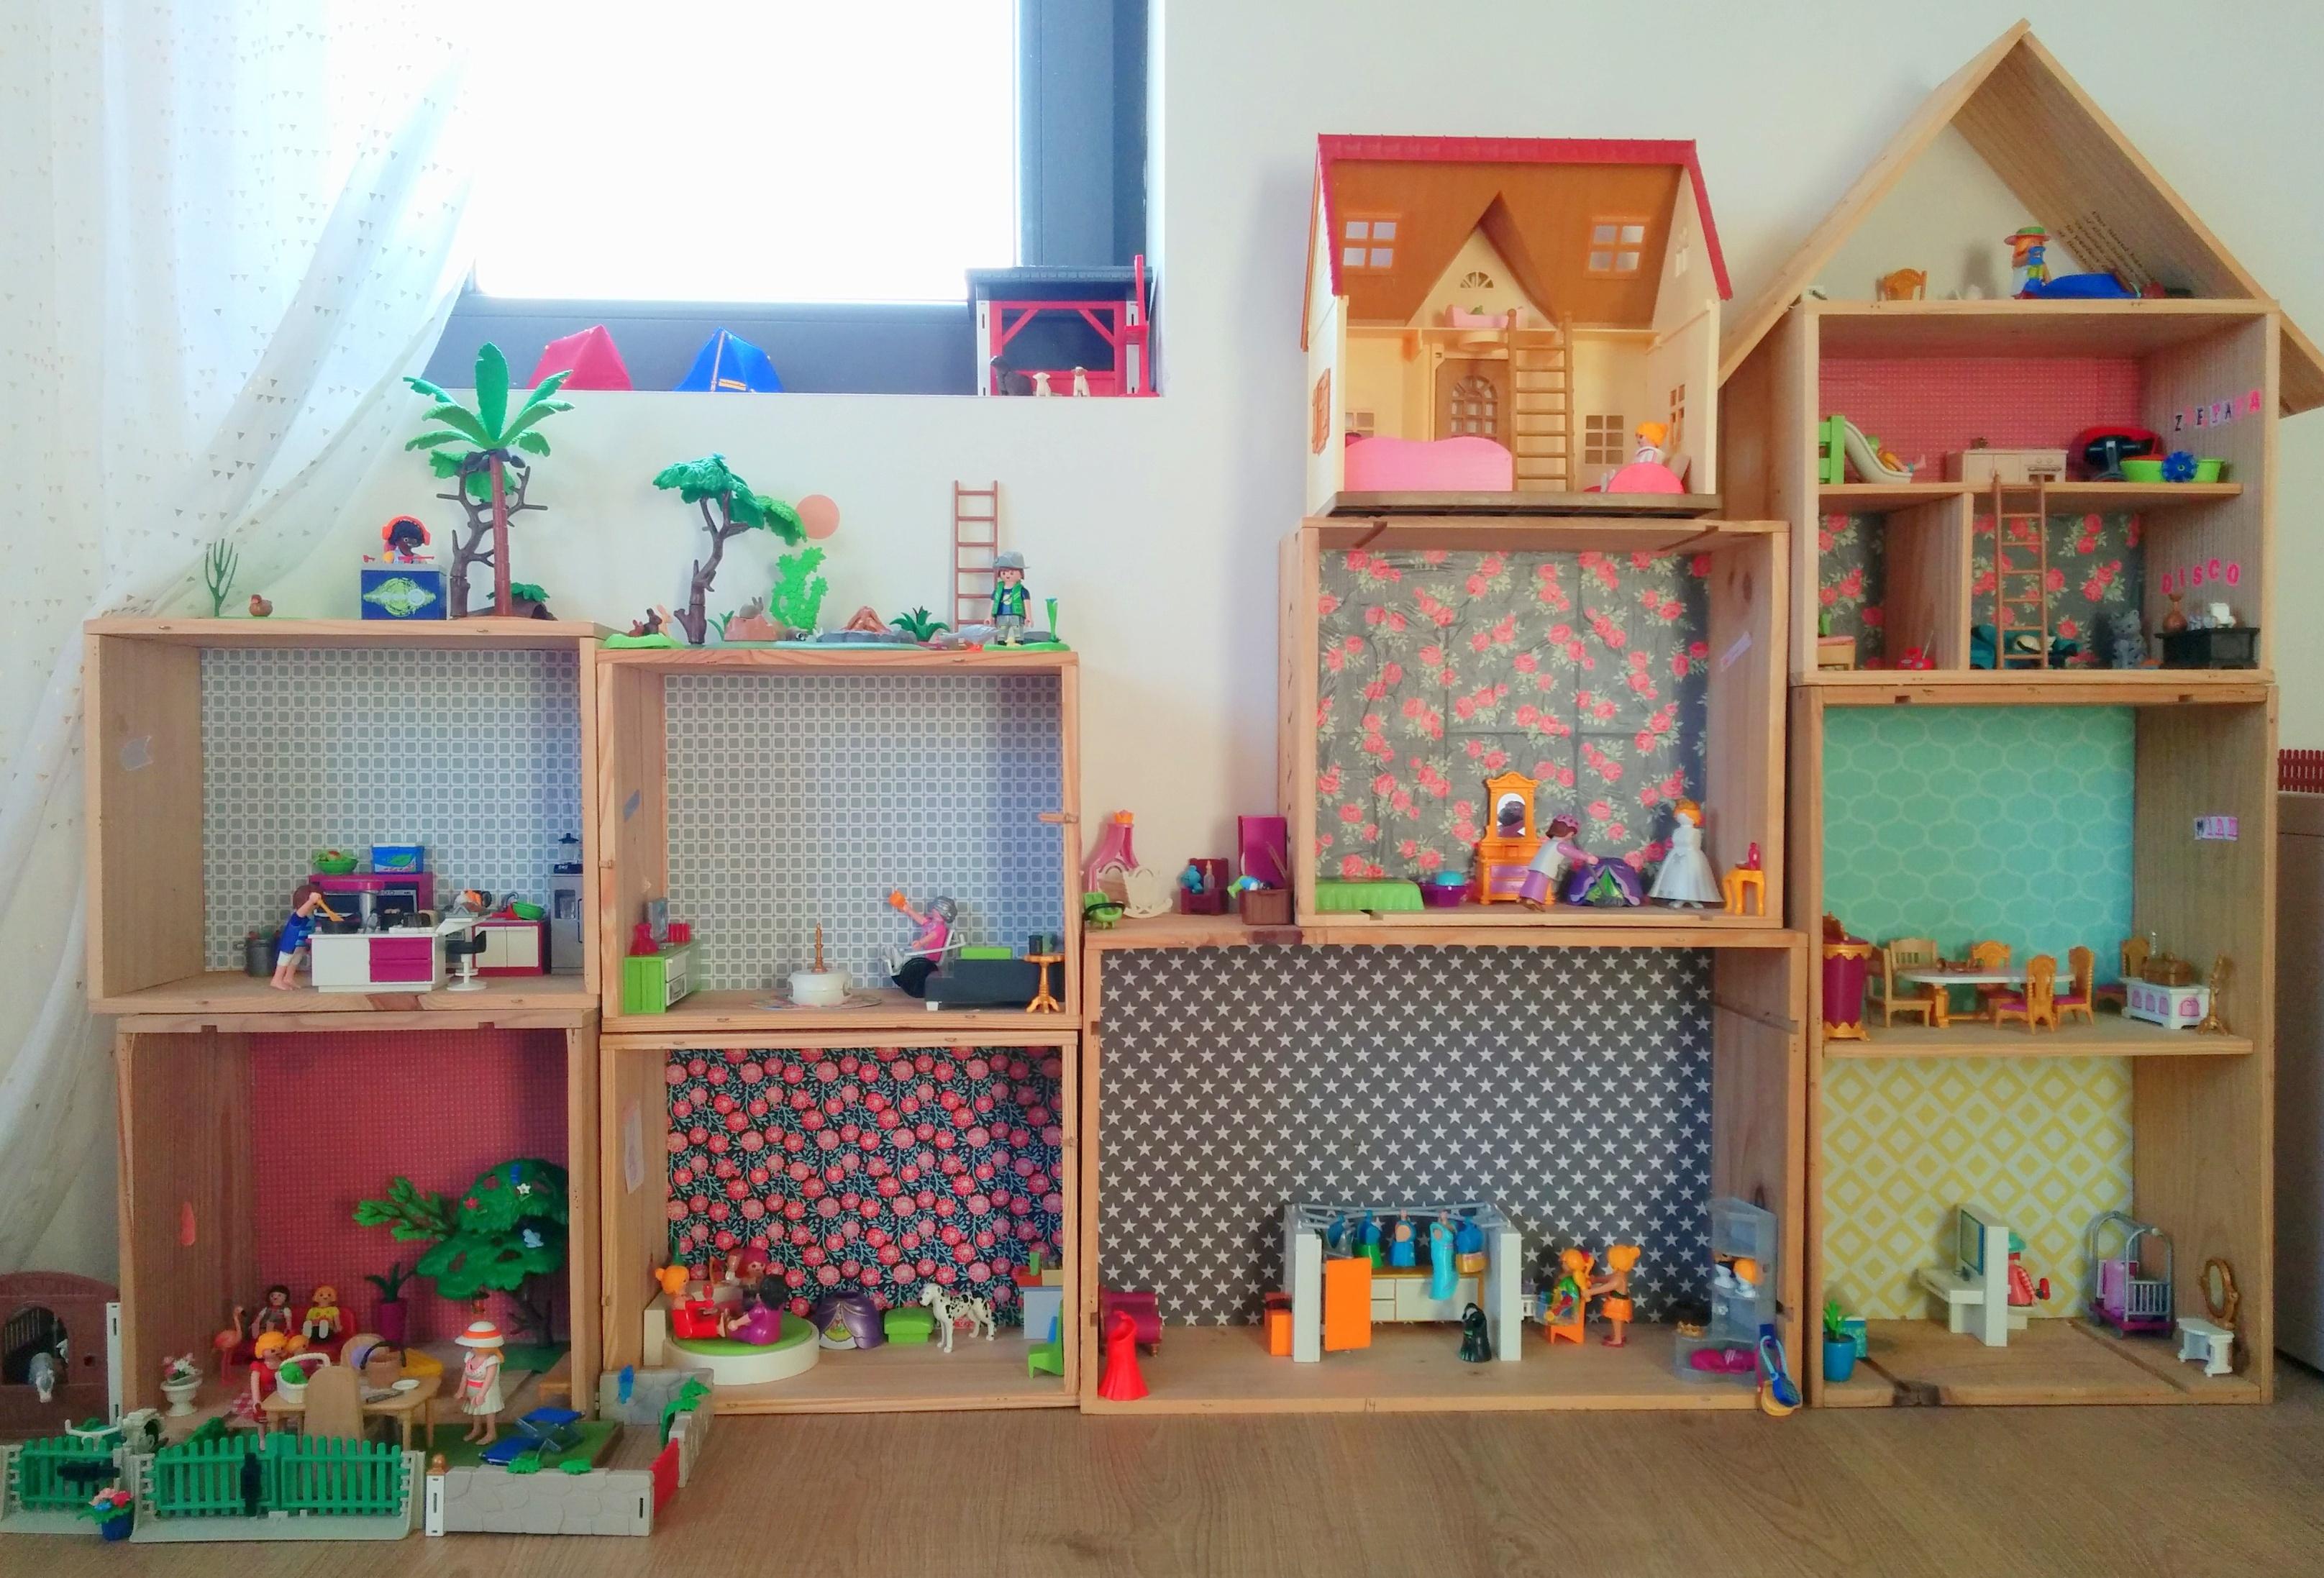 Maison en bois pour playmobil ventana blog - Maison en bois playmobil ...